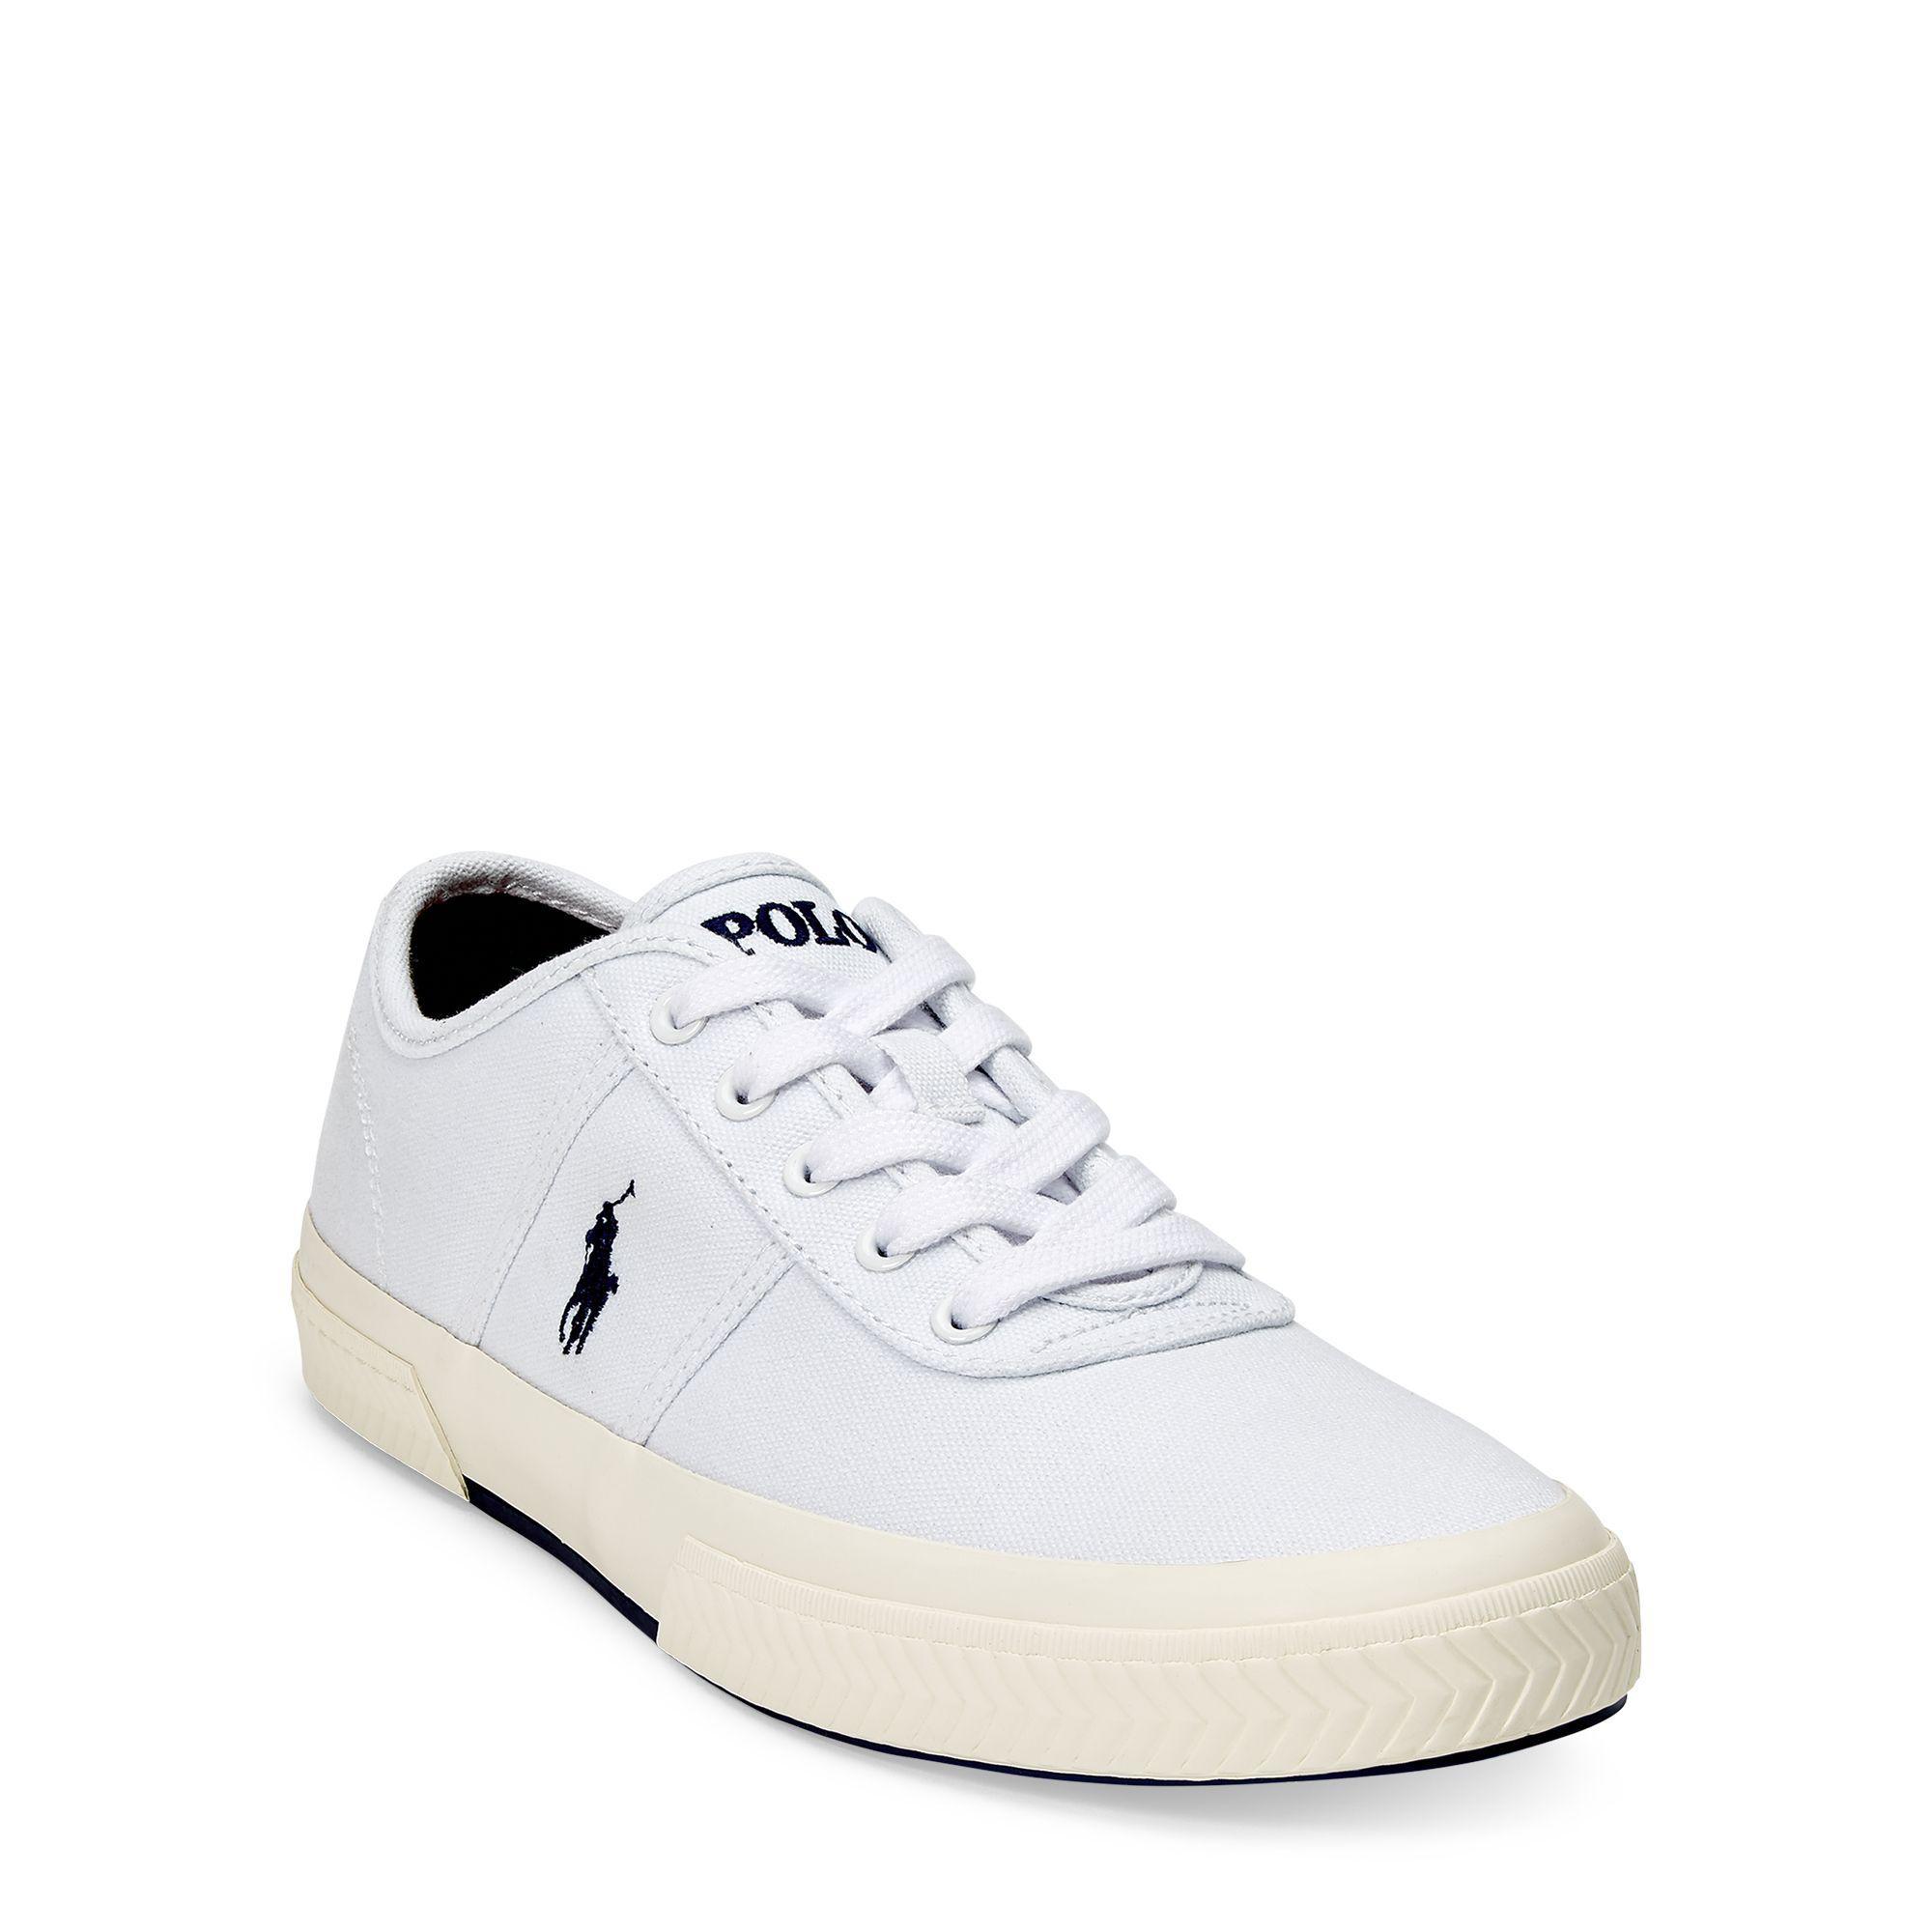 Ralph Lauren Menswear - Ralph Lauren Canvas Tyrian Shoes White